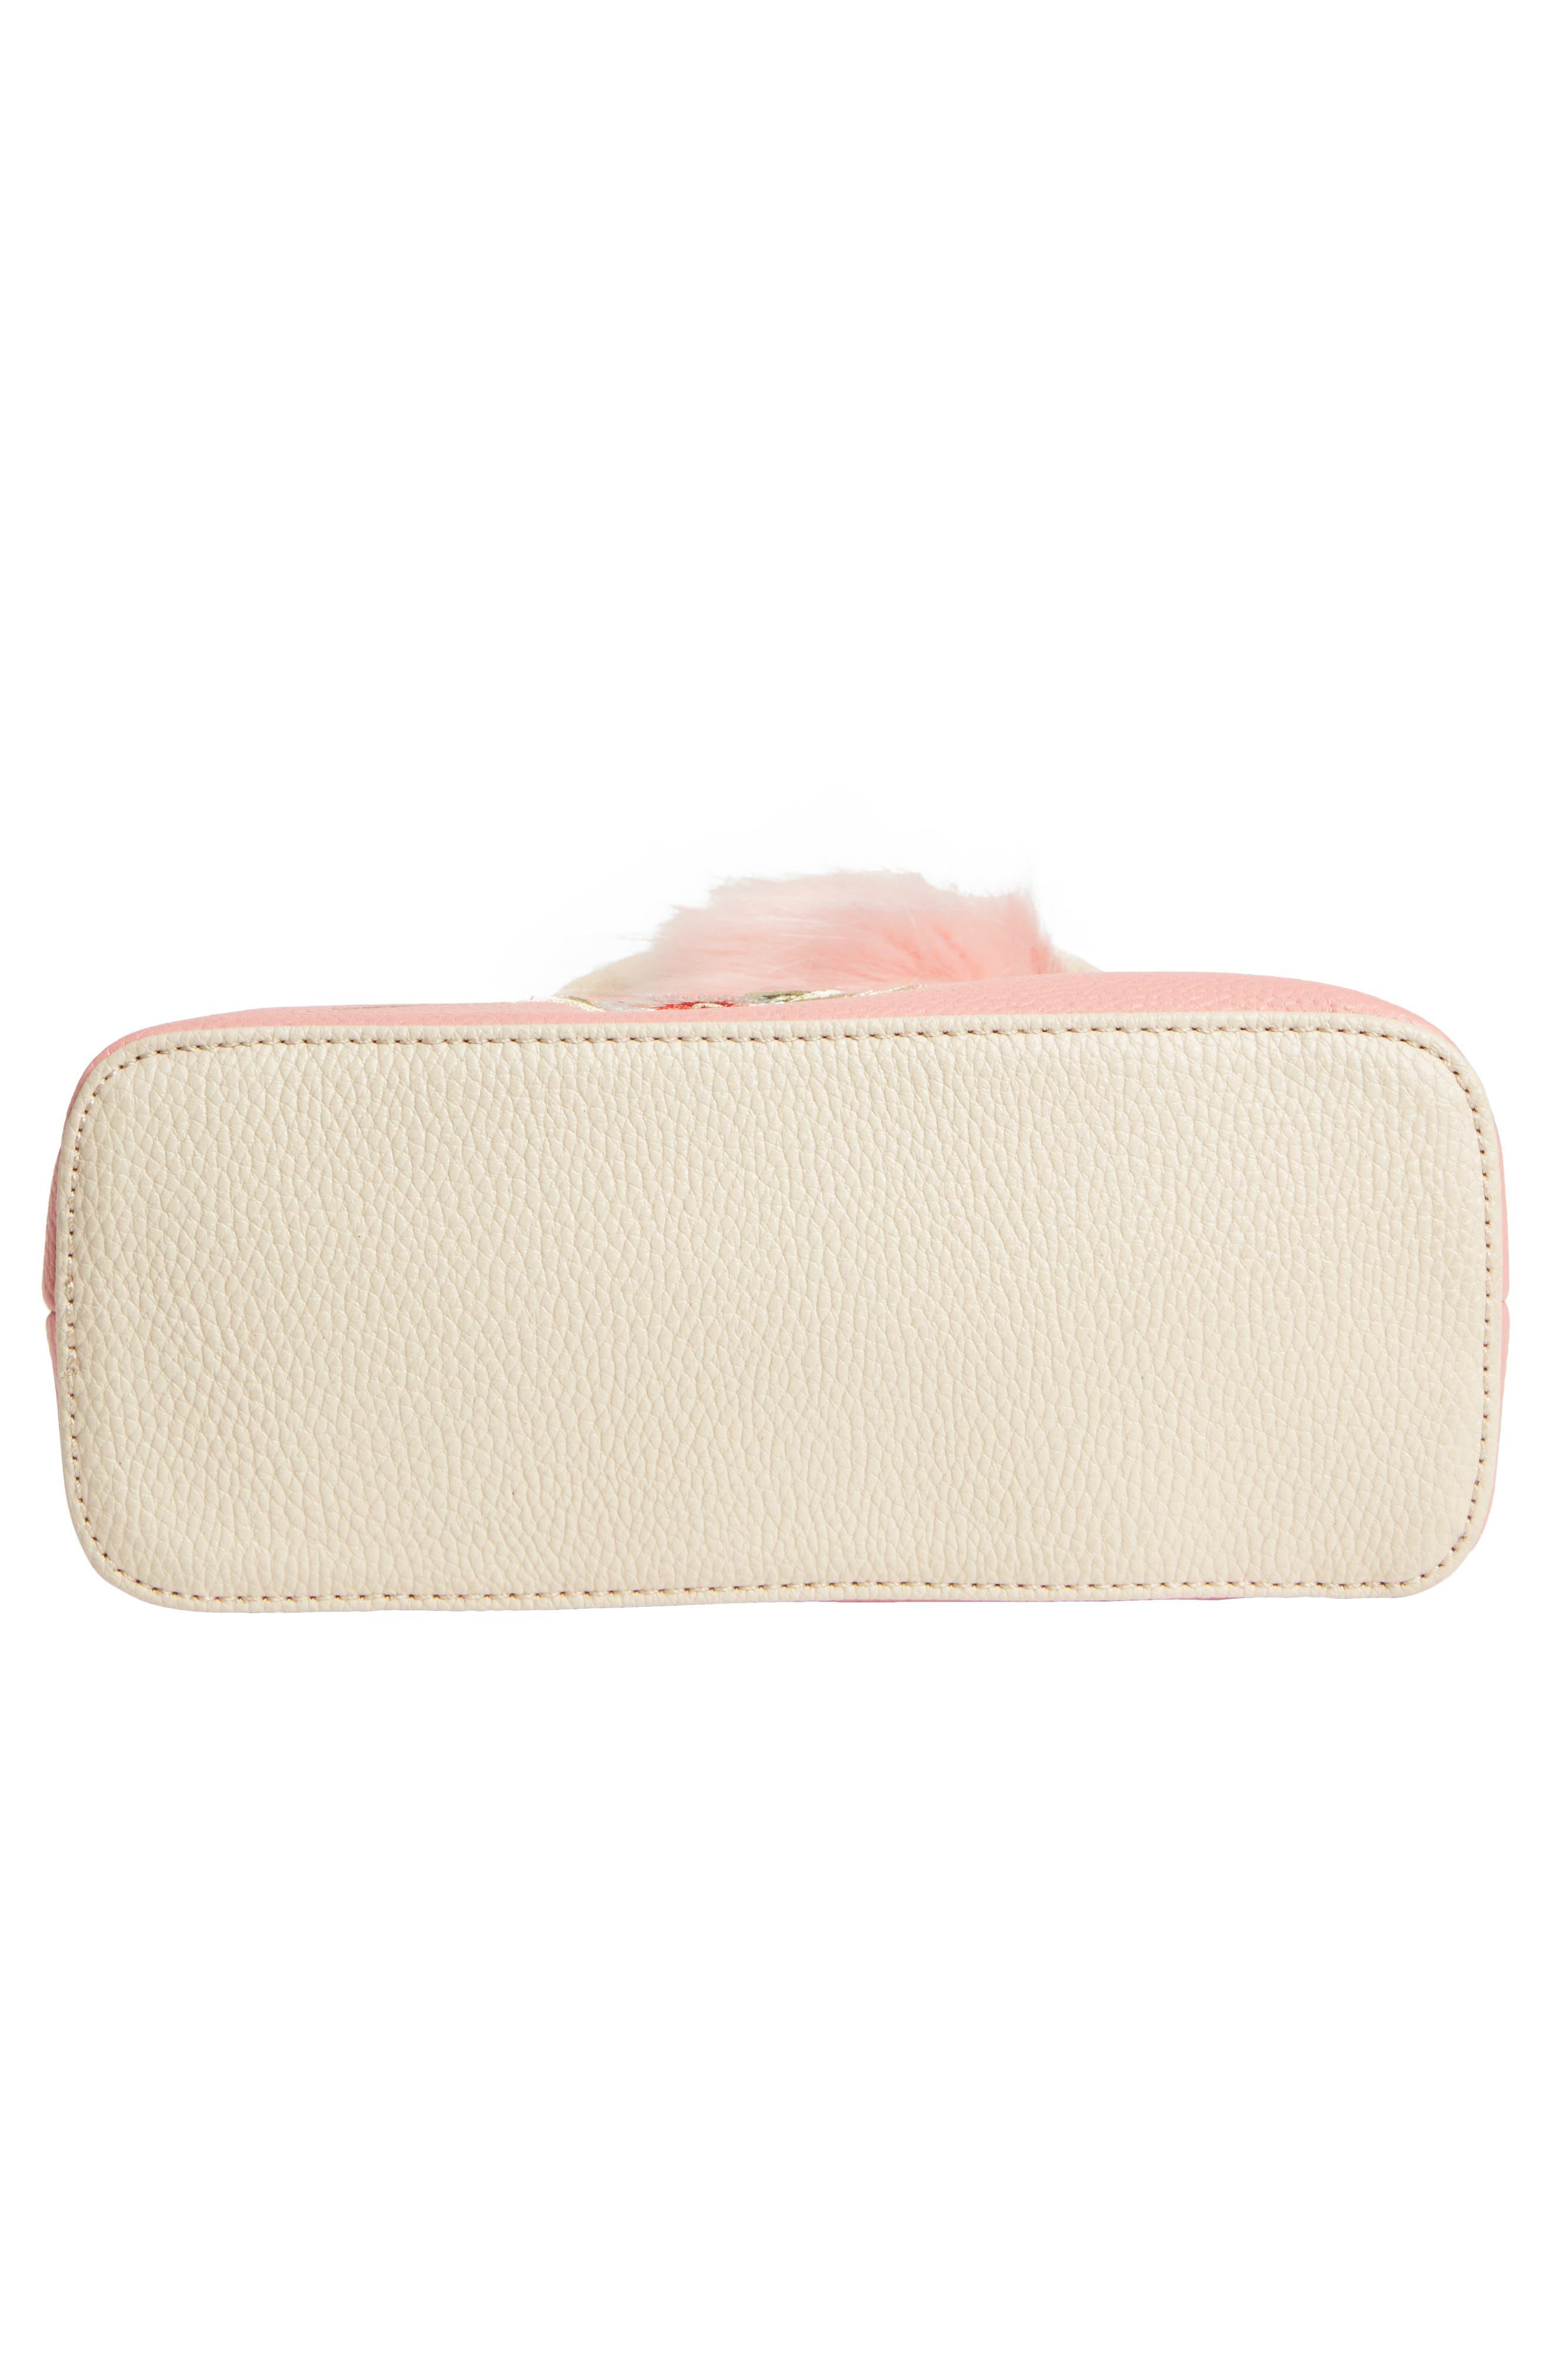 Embroidered Handbag,                             Alternate thumbnail 5, color,                             Pink